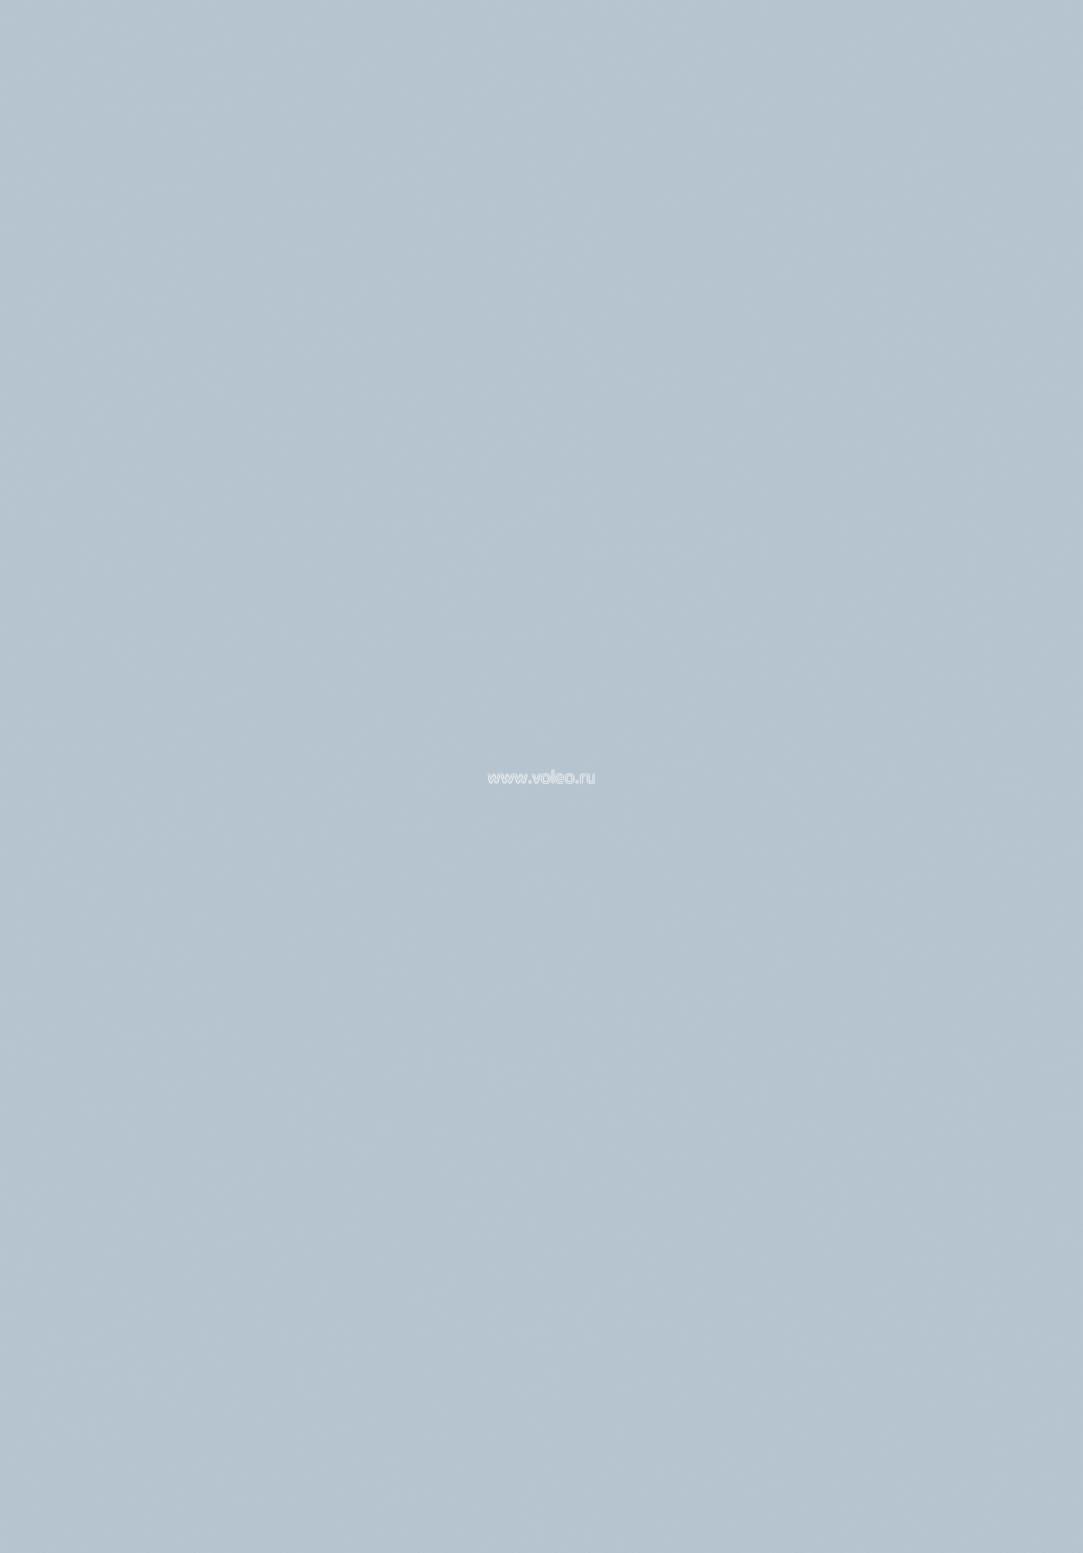 Обои Cole & Son Frontier 89/12049, интернет магазин Волео